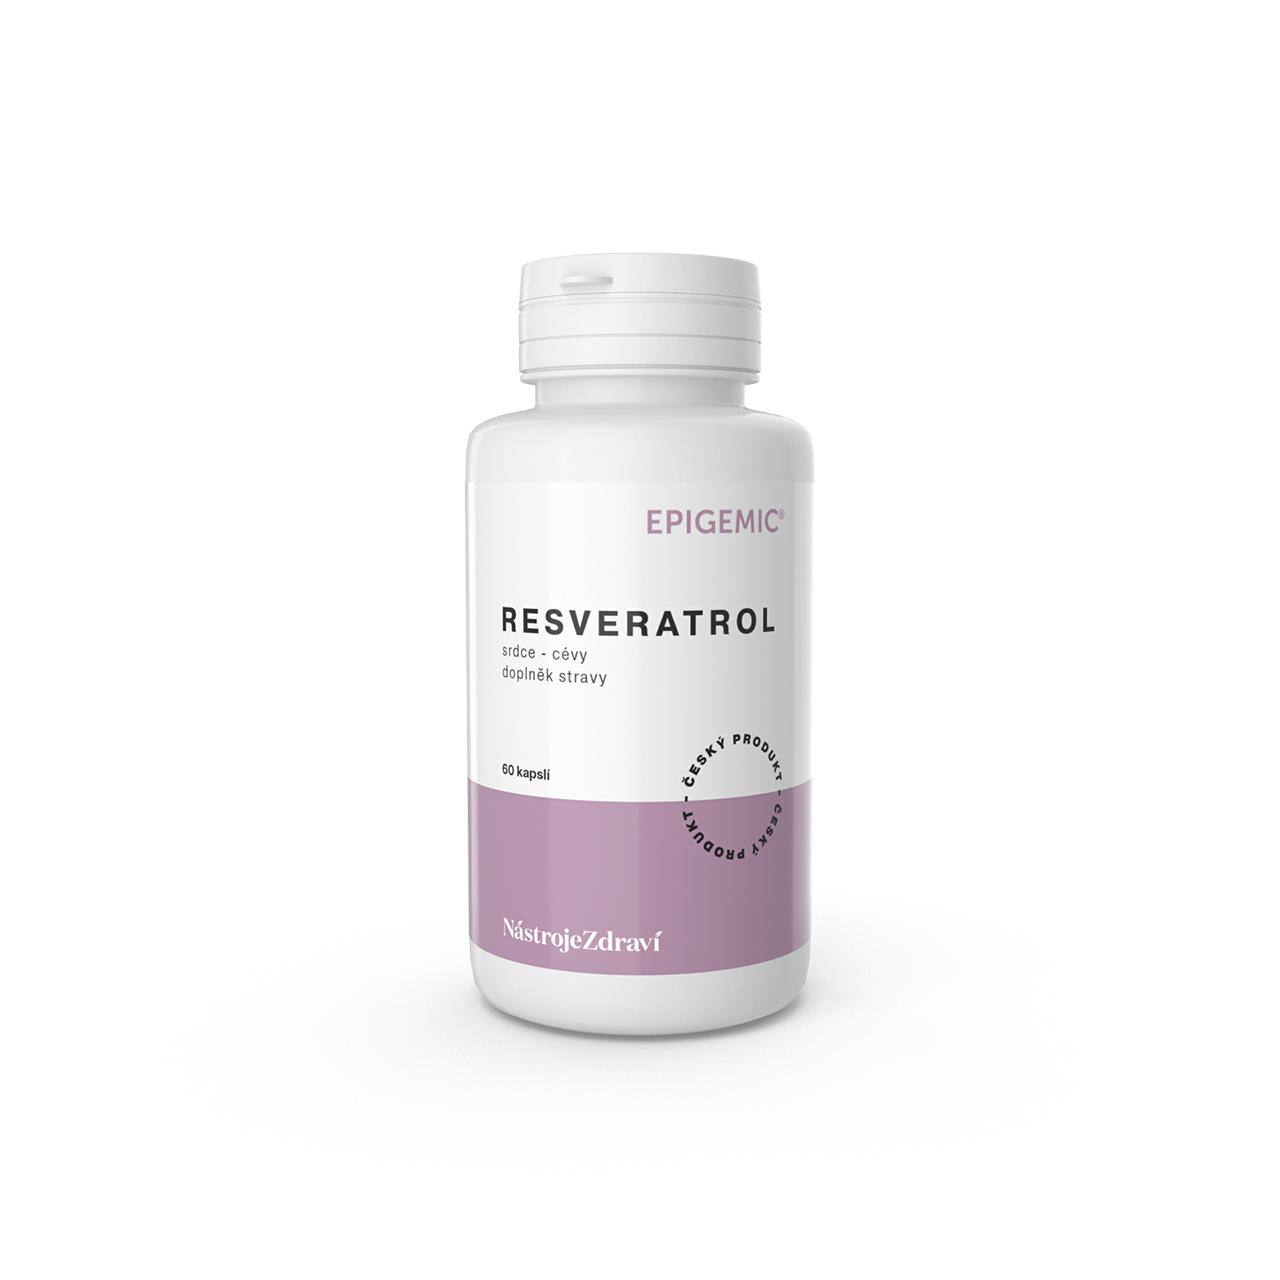 Epigemic Resveratrol, kapsle 30,5 g, 60 ks